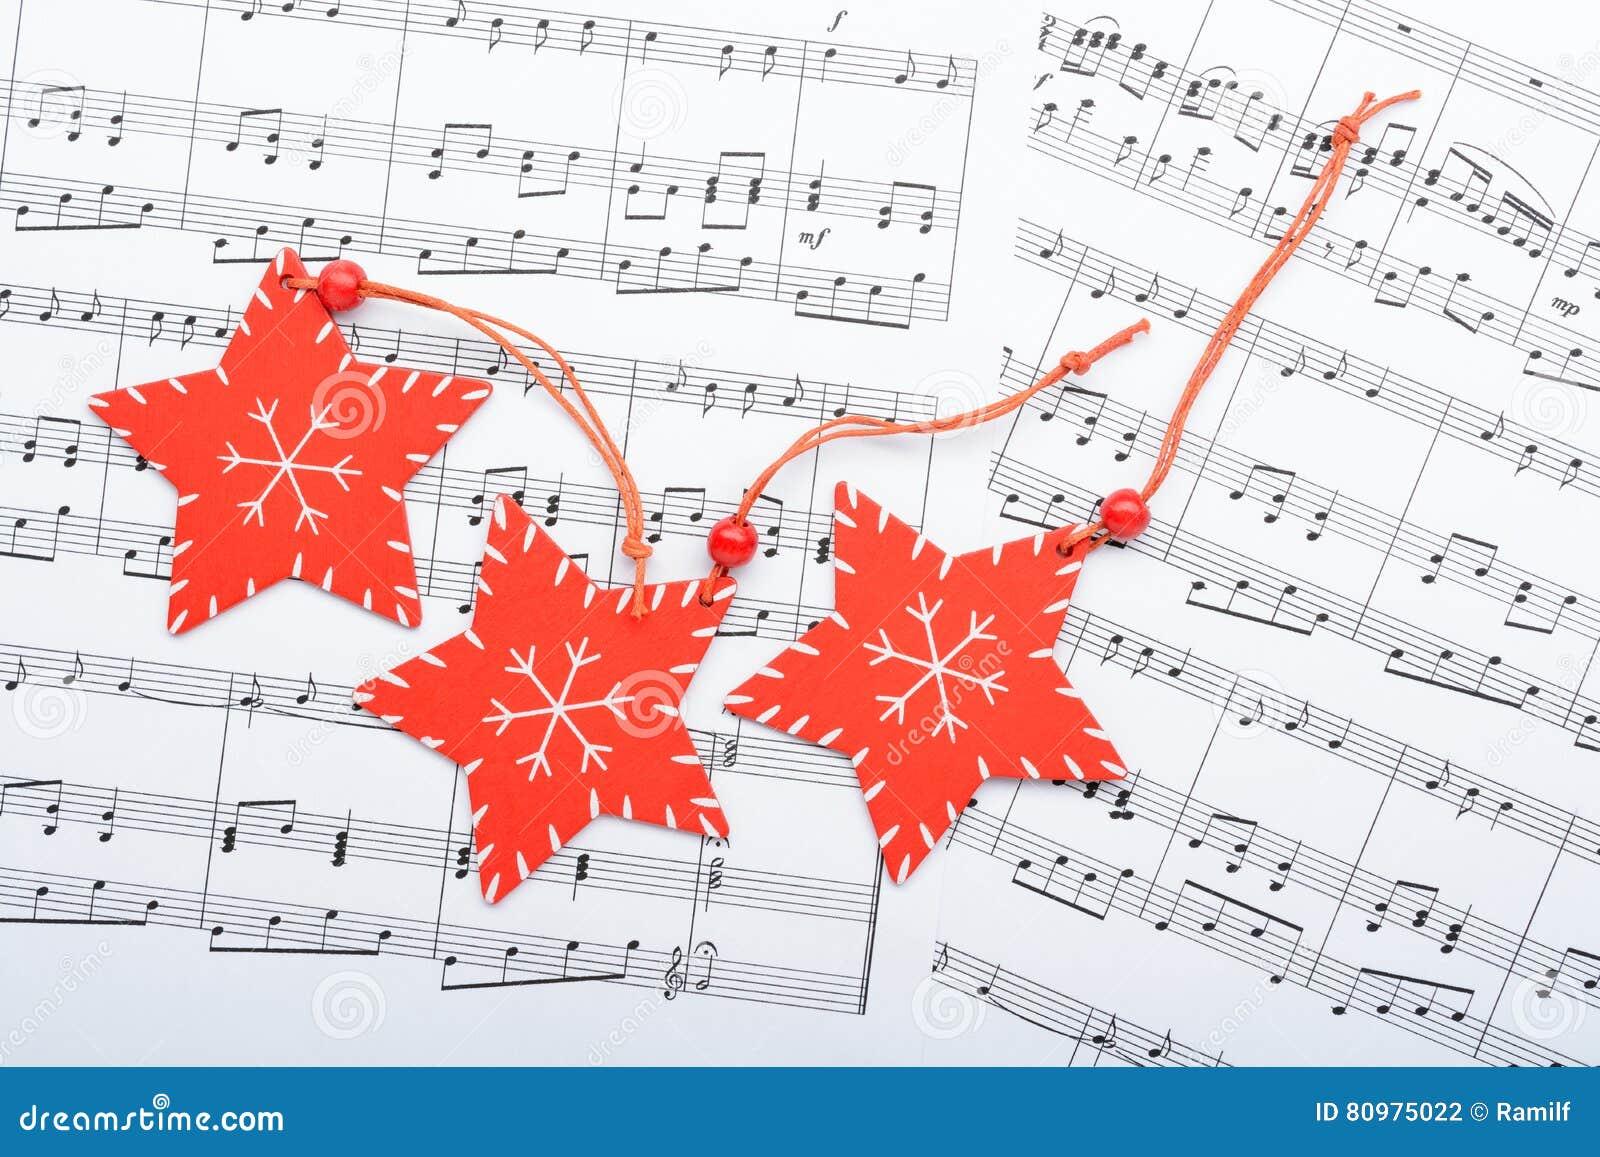 Christmas Decorations Lying On Notes Sheet Stock Photo - Image of ...